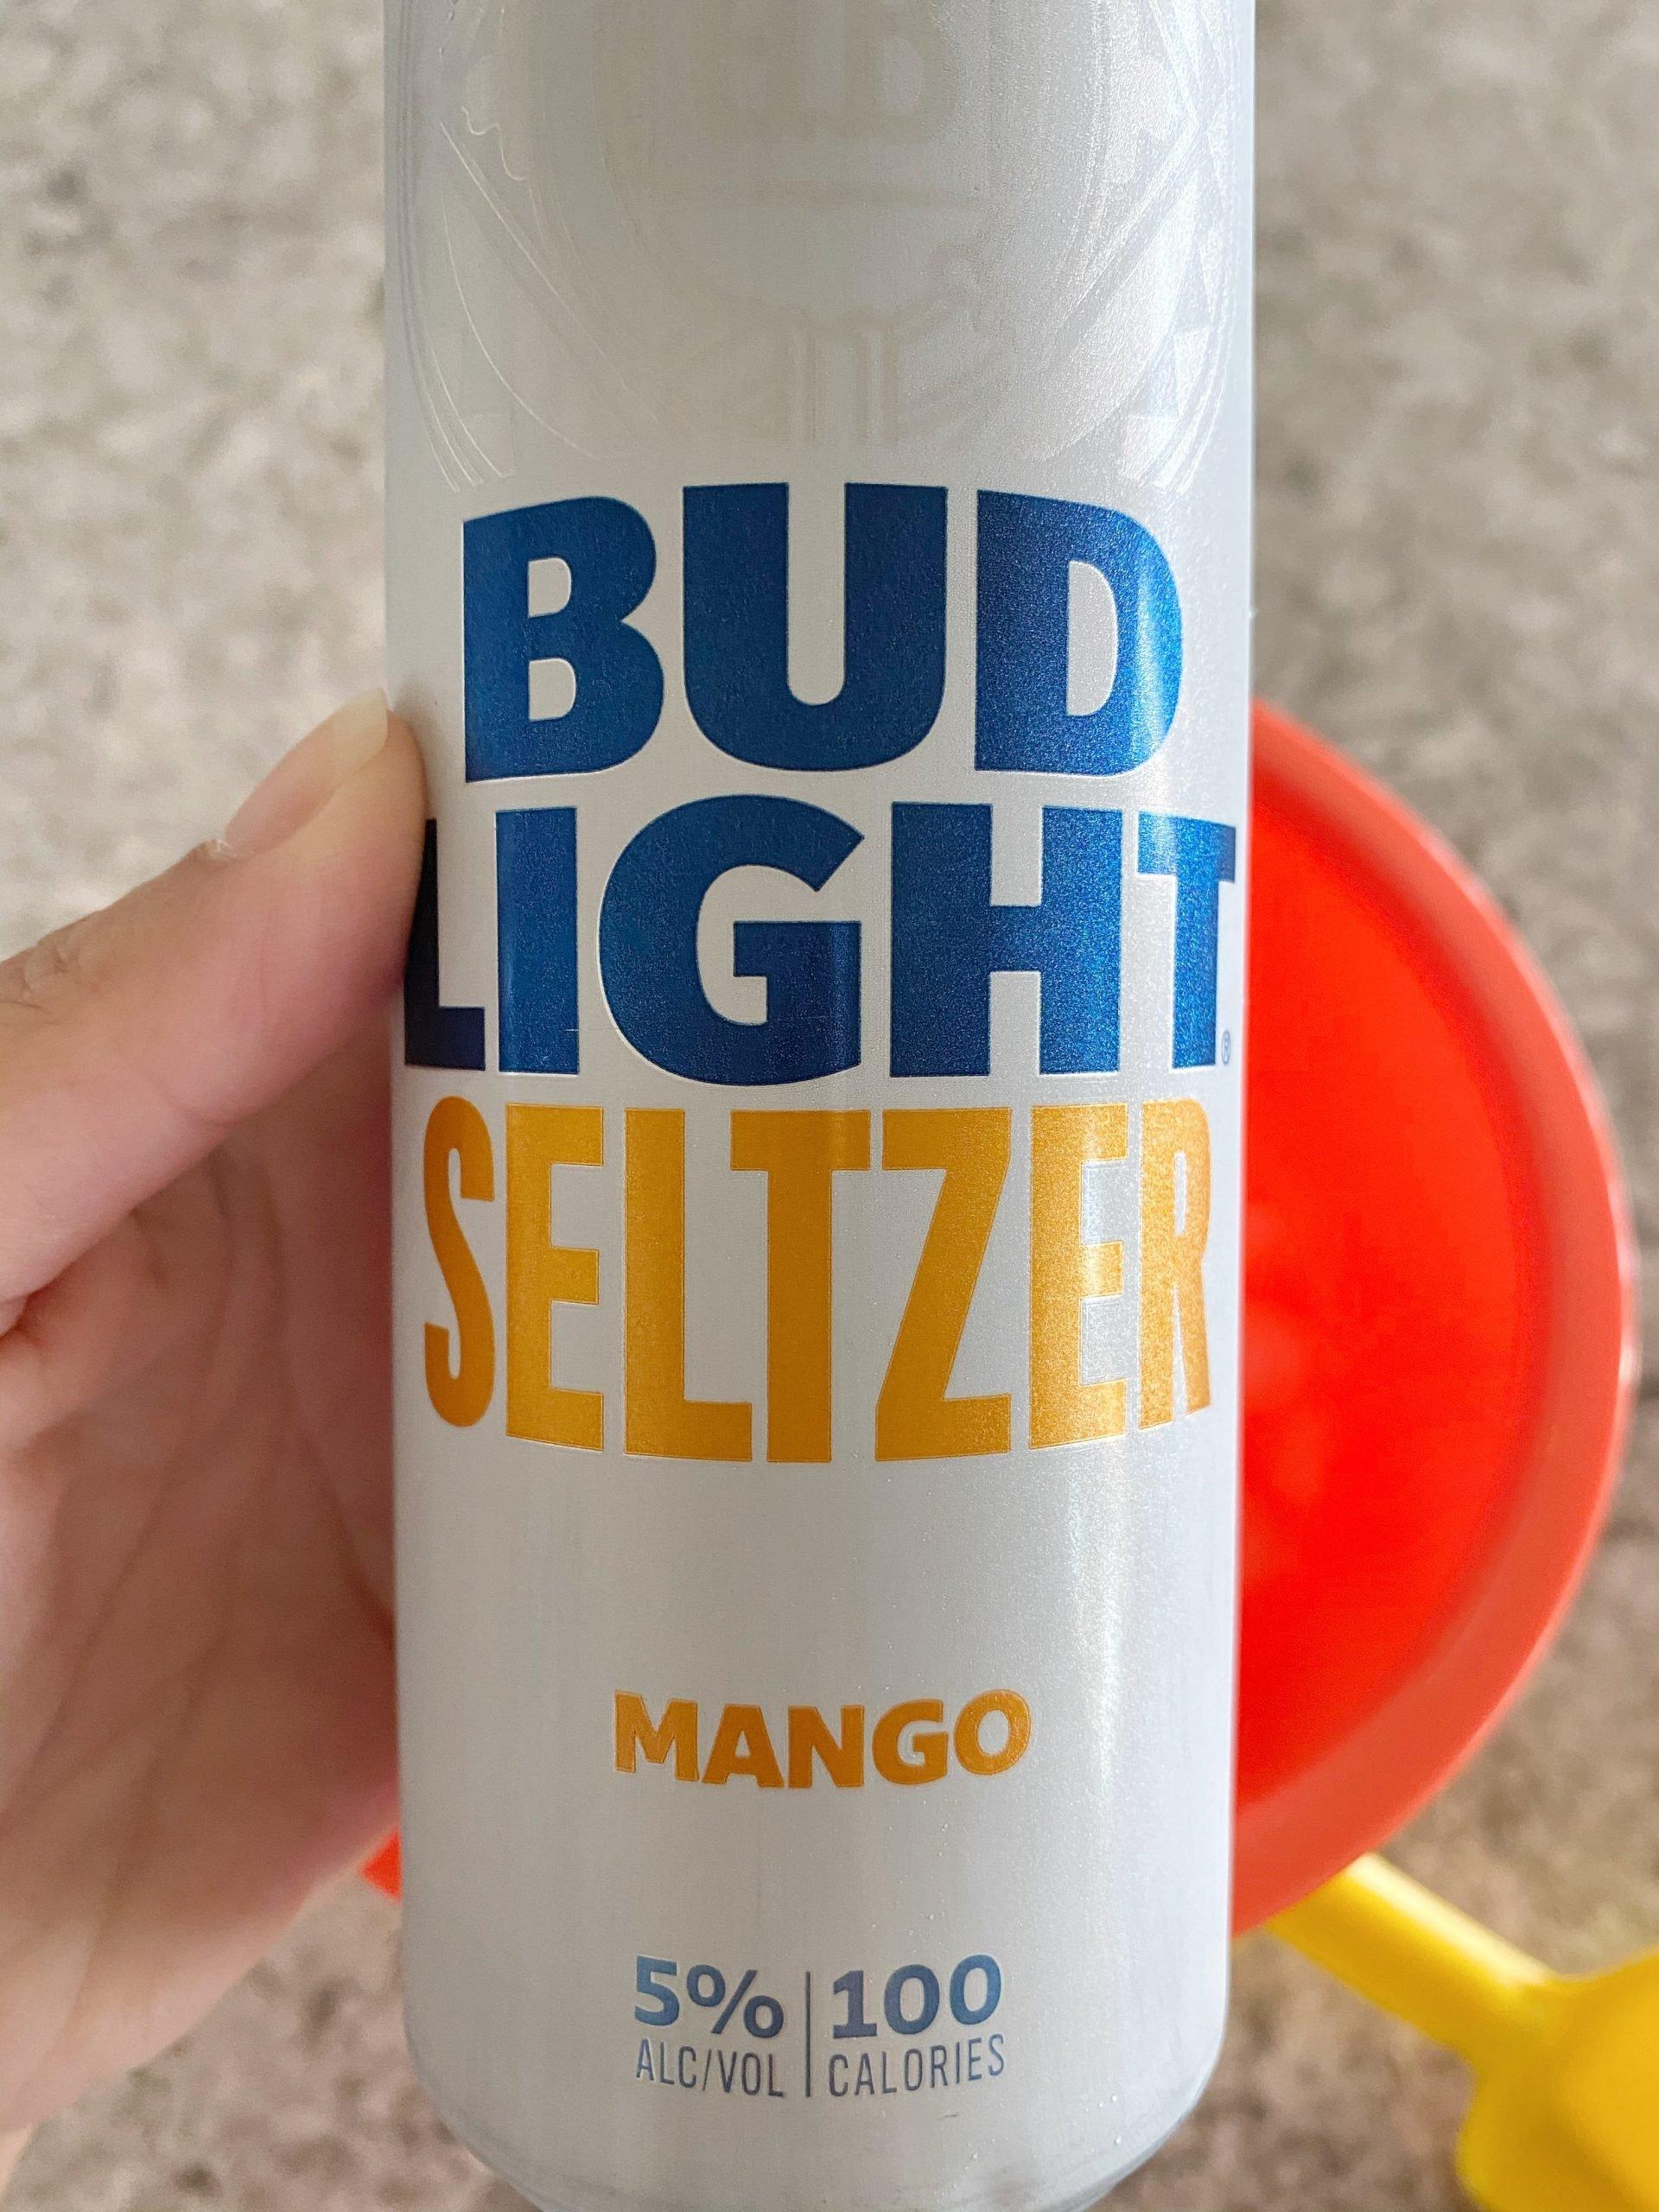 mango Bud Light Seltzer